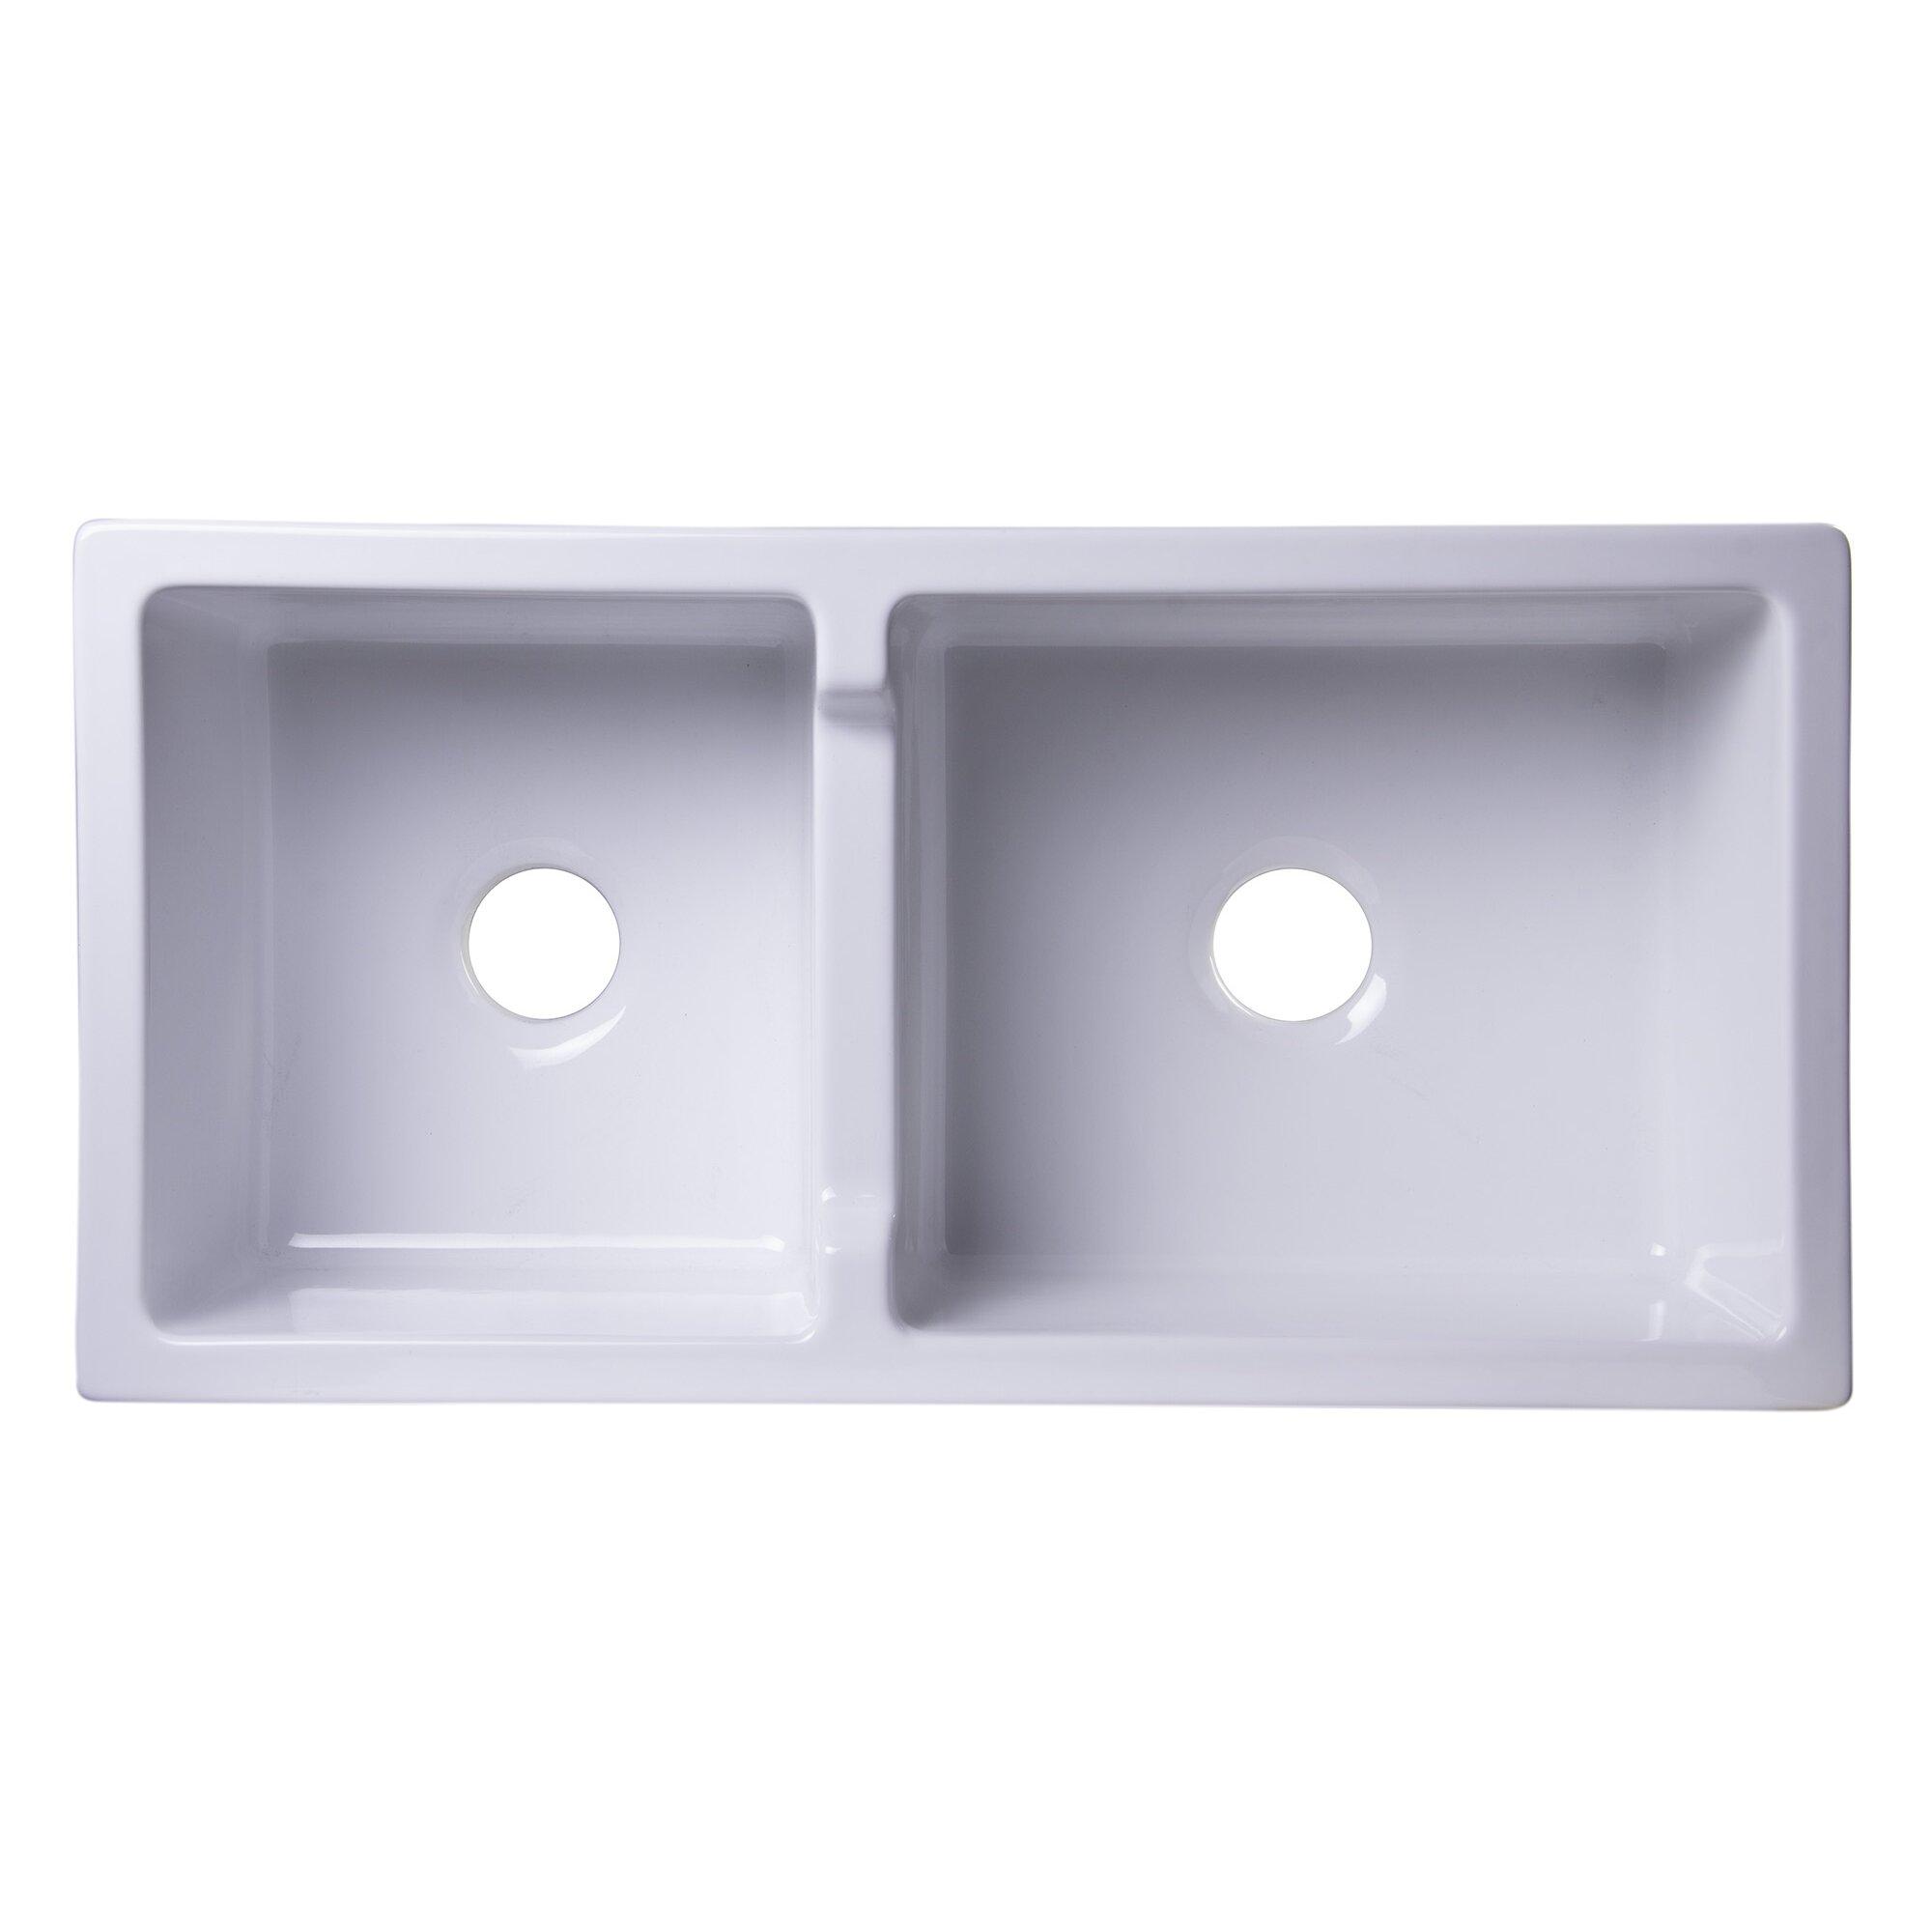 Fireclay Double Bowl Farmhouse Sink : ... Wall Fireclay Double Bowl Farmhouse Kitchen Sink & Reviews Wayfair